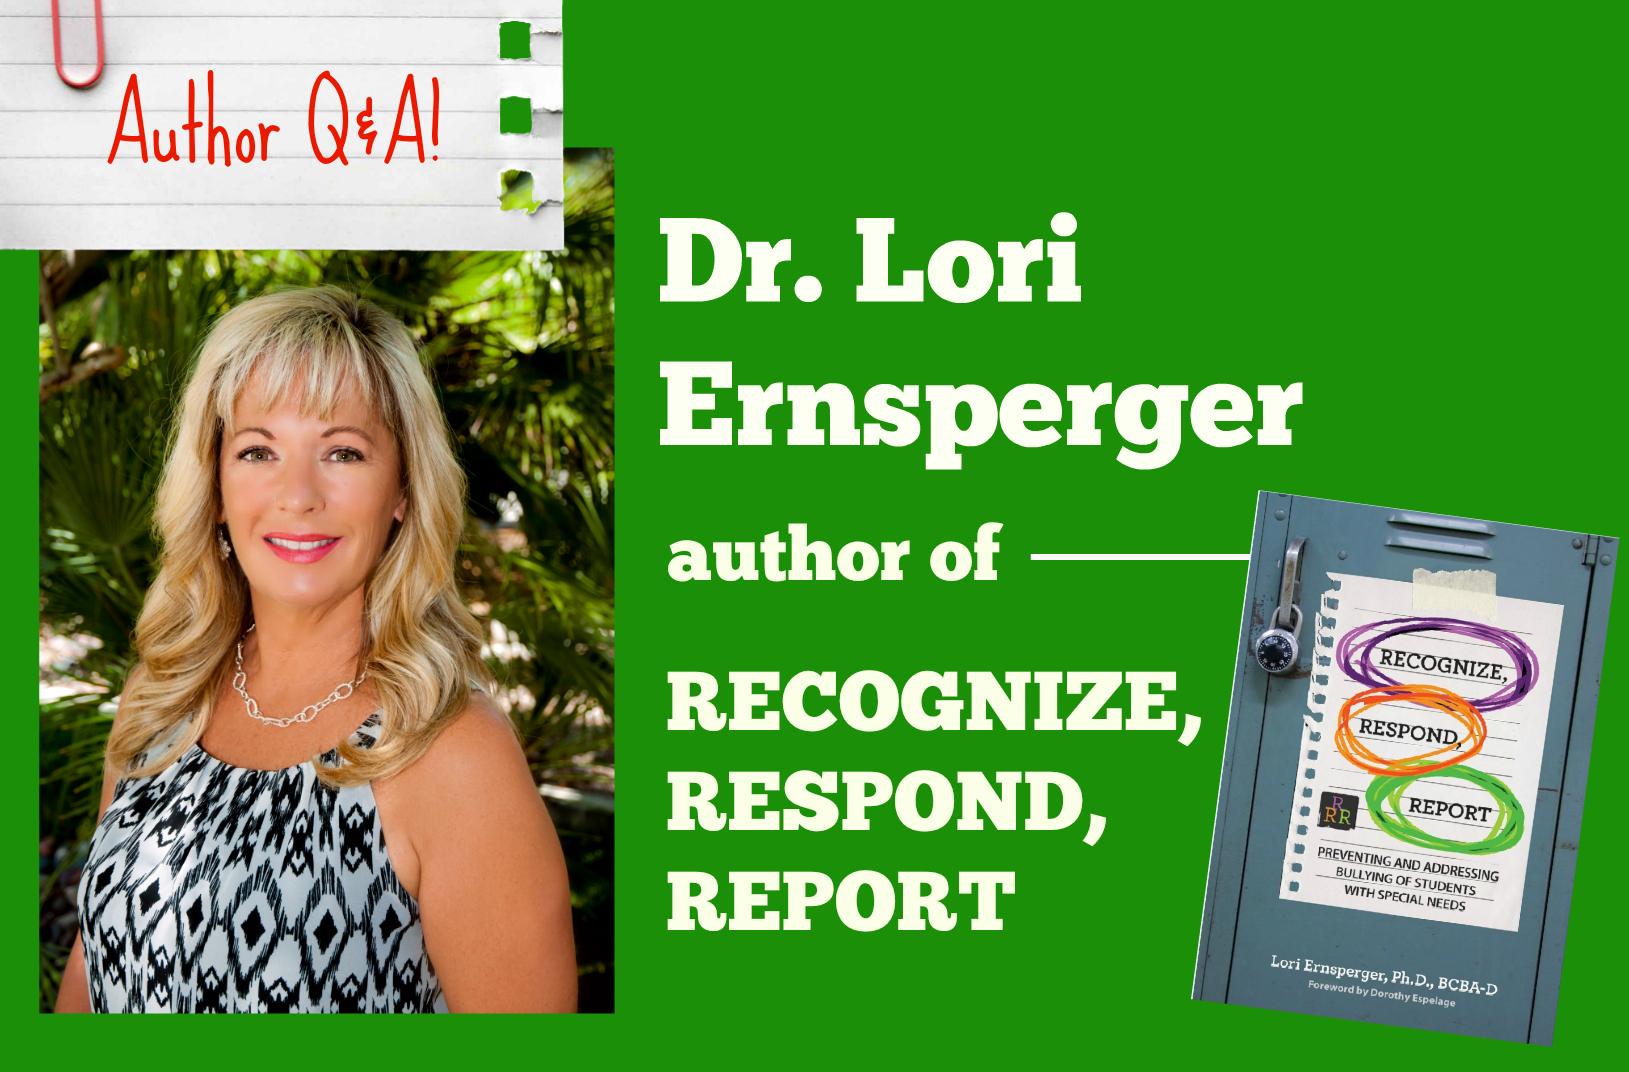 Dr. Lori Ernsperger author interview